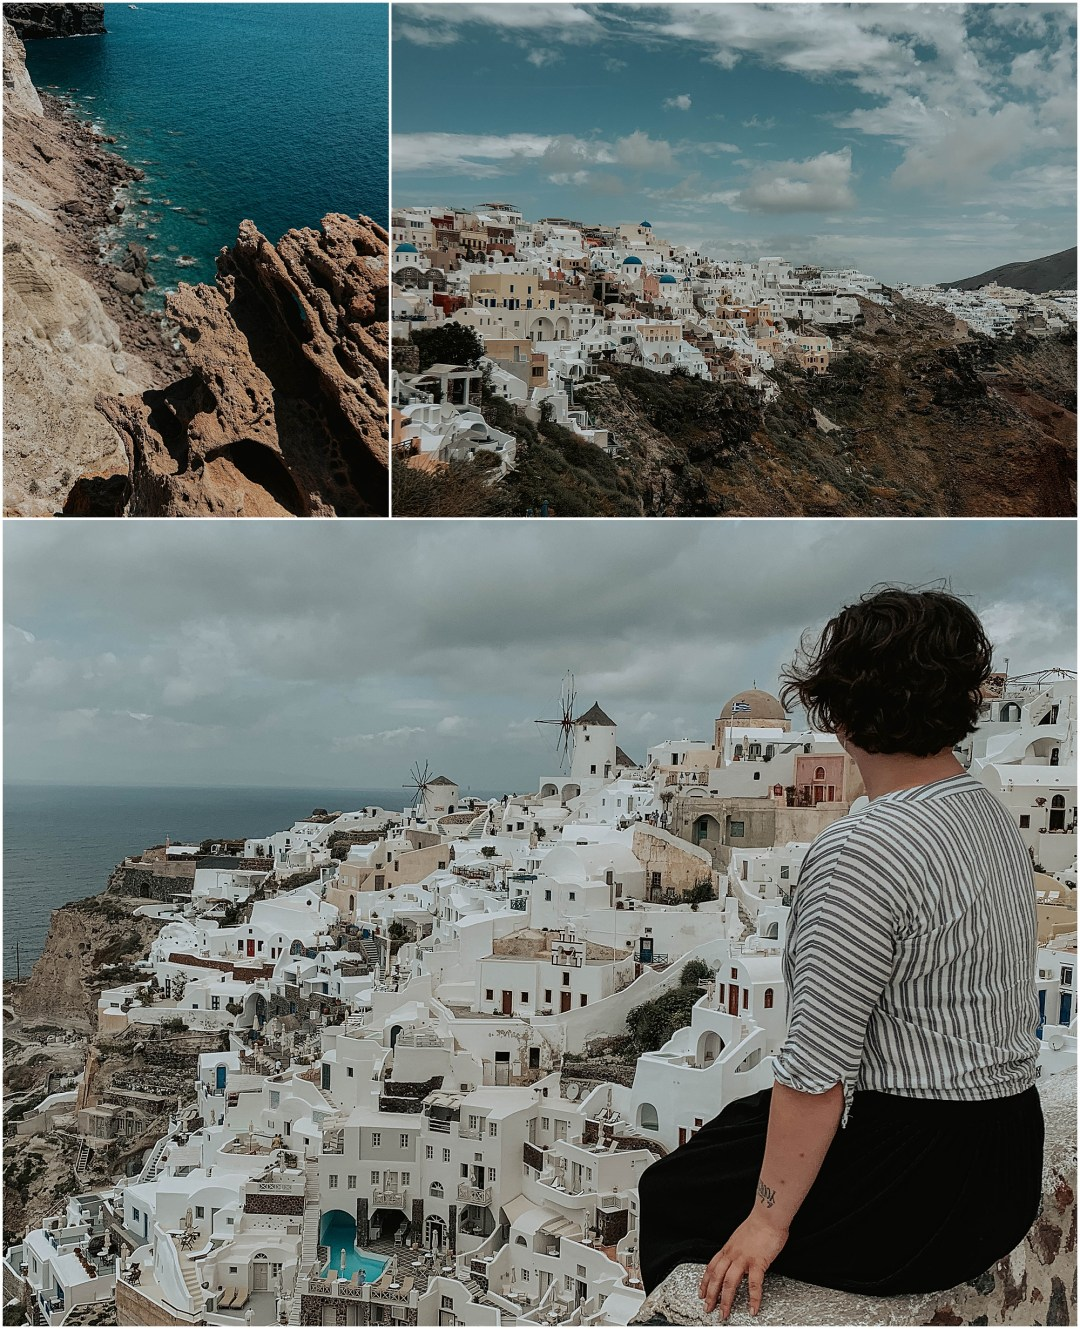 moment-camera, moment-lens, seattle-photographer, florence-italy, venice-italy, santorini-greece, naples-italy, italy, greece, steets-of-italy, Iphone-photos, travel-photographer, travel-photos,